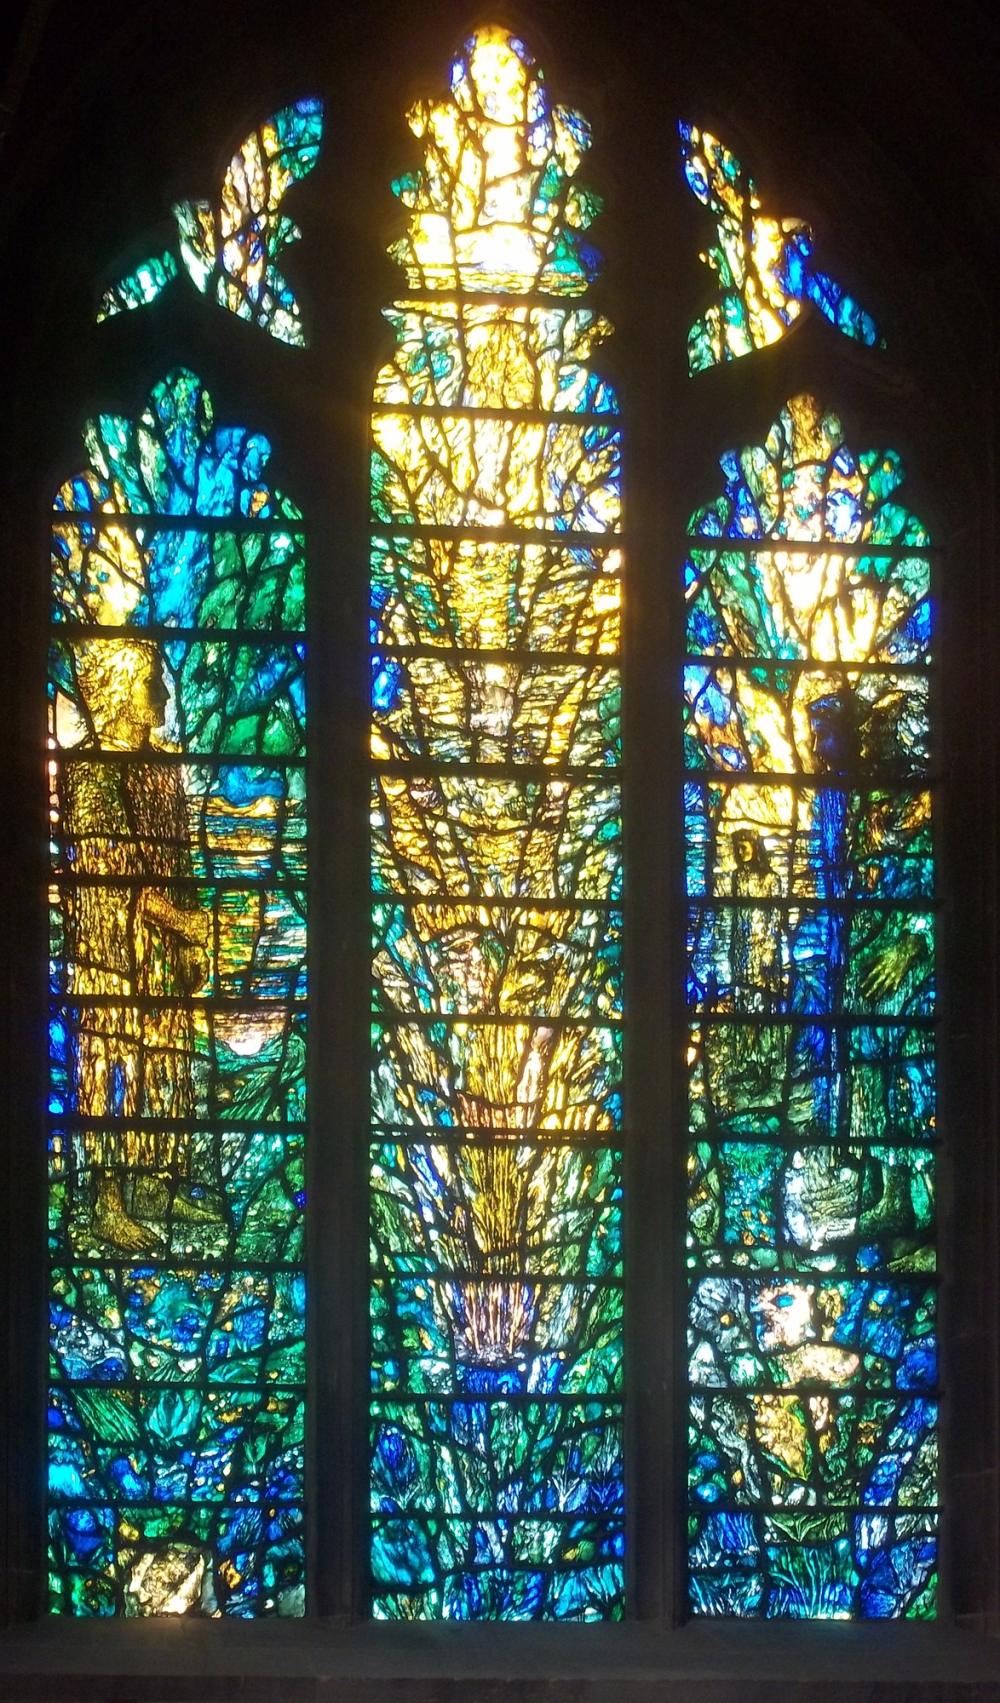 Tewkesbury Abbey detail modern windows left